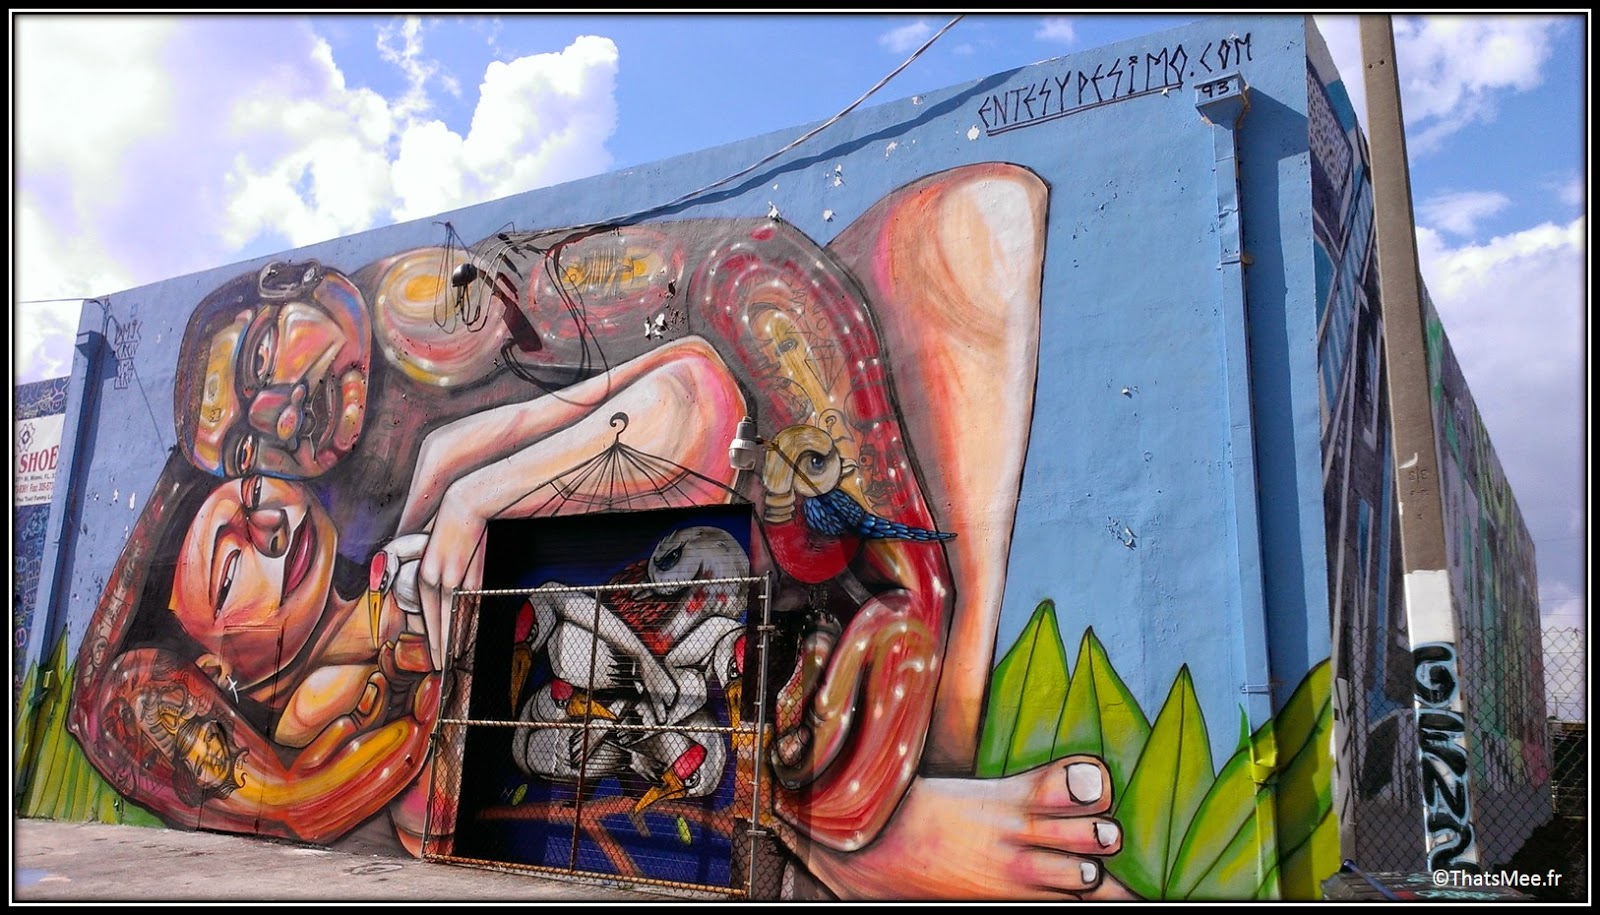 Entes y pésimo street art Wynwood walls Miami, Miami art basel